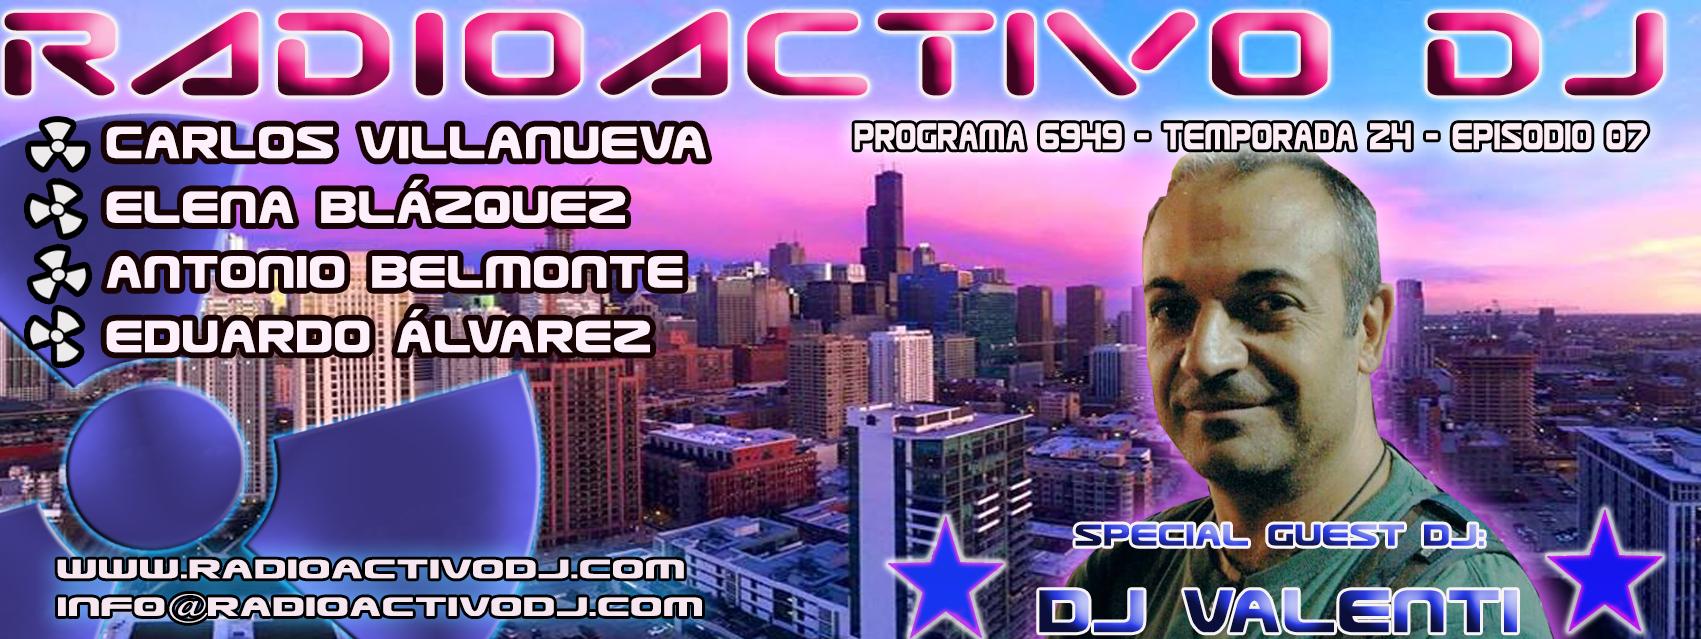 RADIOACTIVO DJ 07-2016